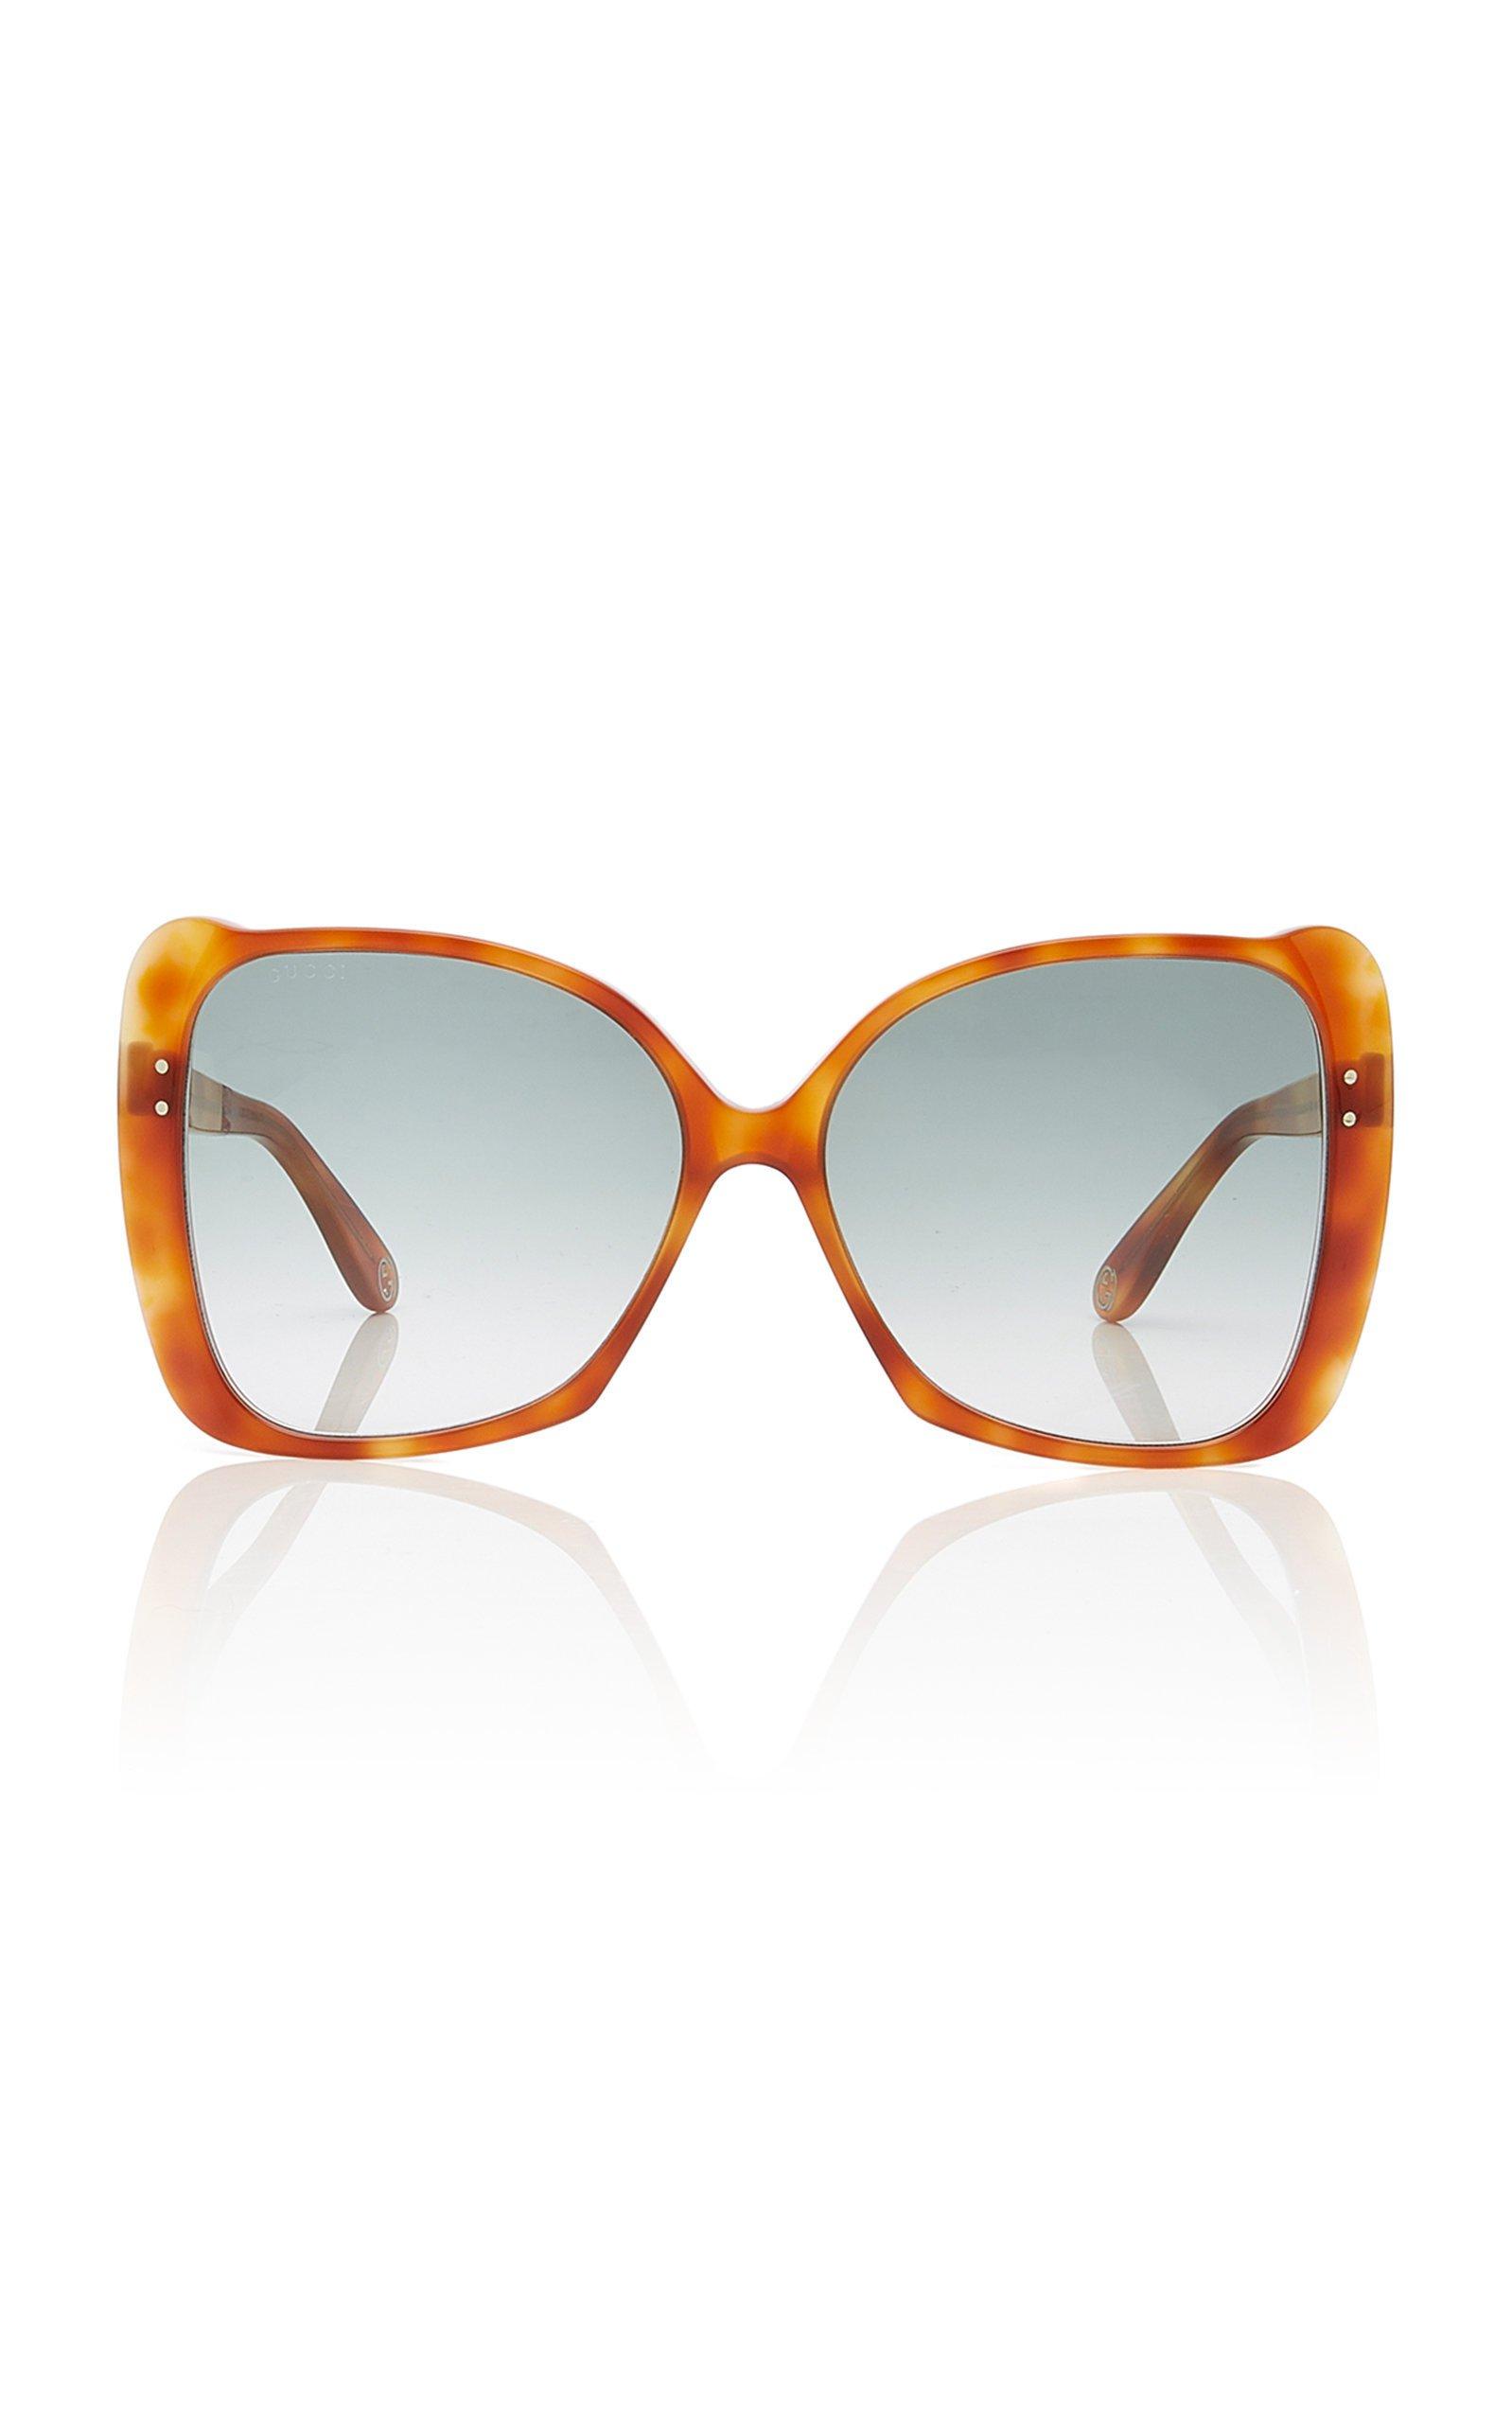 Gucci Sunglasses Butterfly-Frame Tortoiseshell Acetate Sunglasses